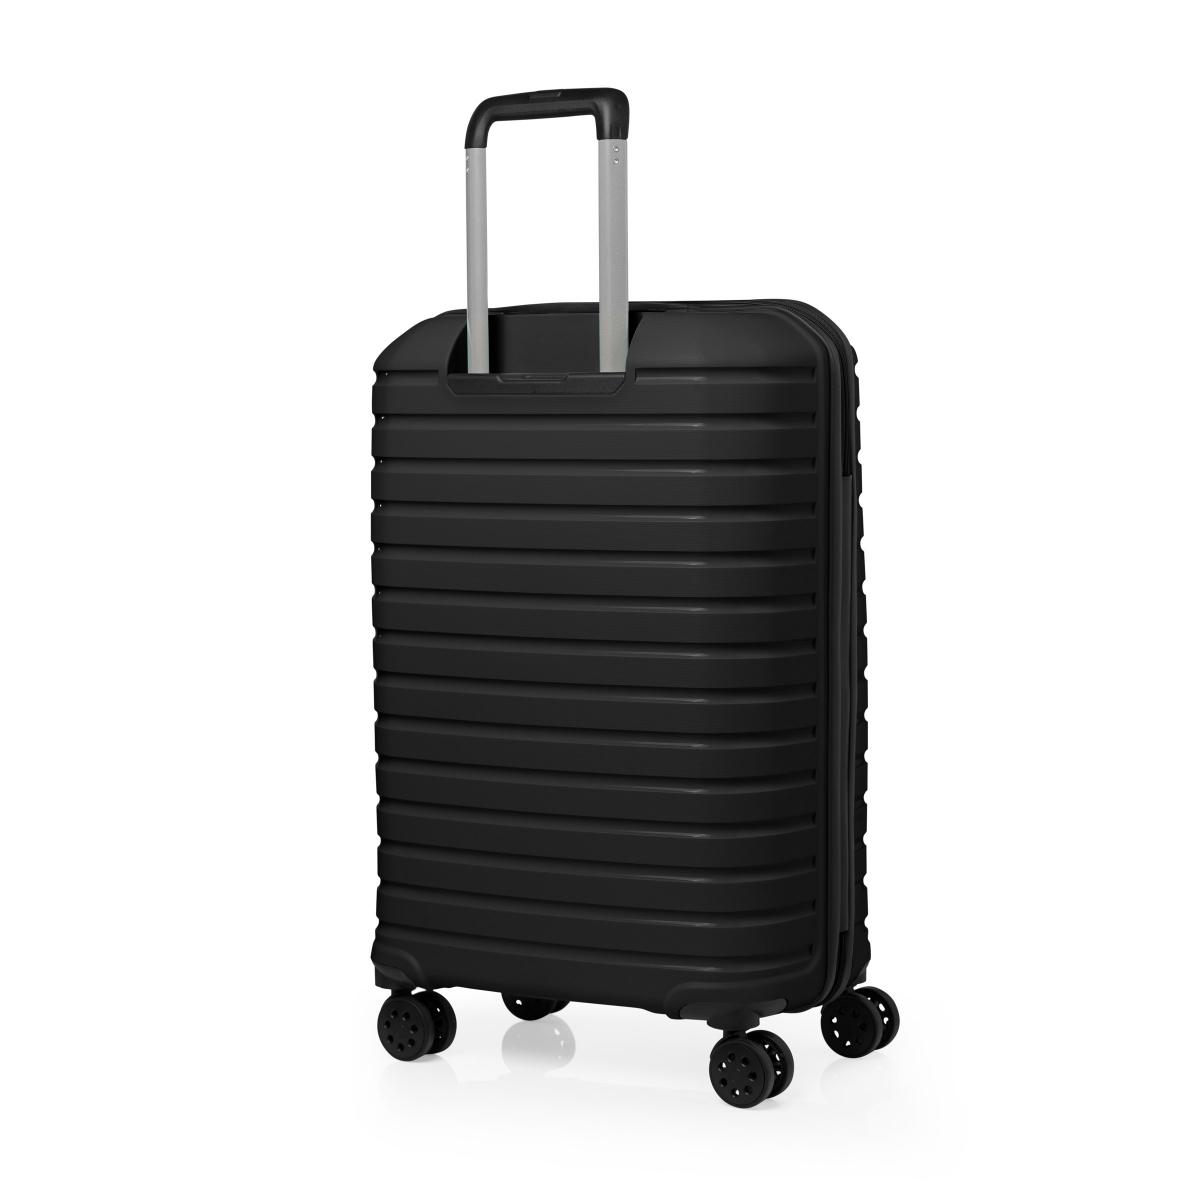 G&D Polo Suitcase PP Enjeksiyon 3'lü Valiz Seyahat Seti - Model 400.01 Siyah